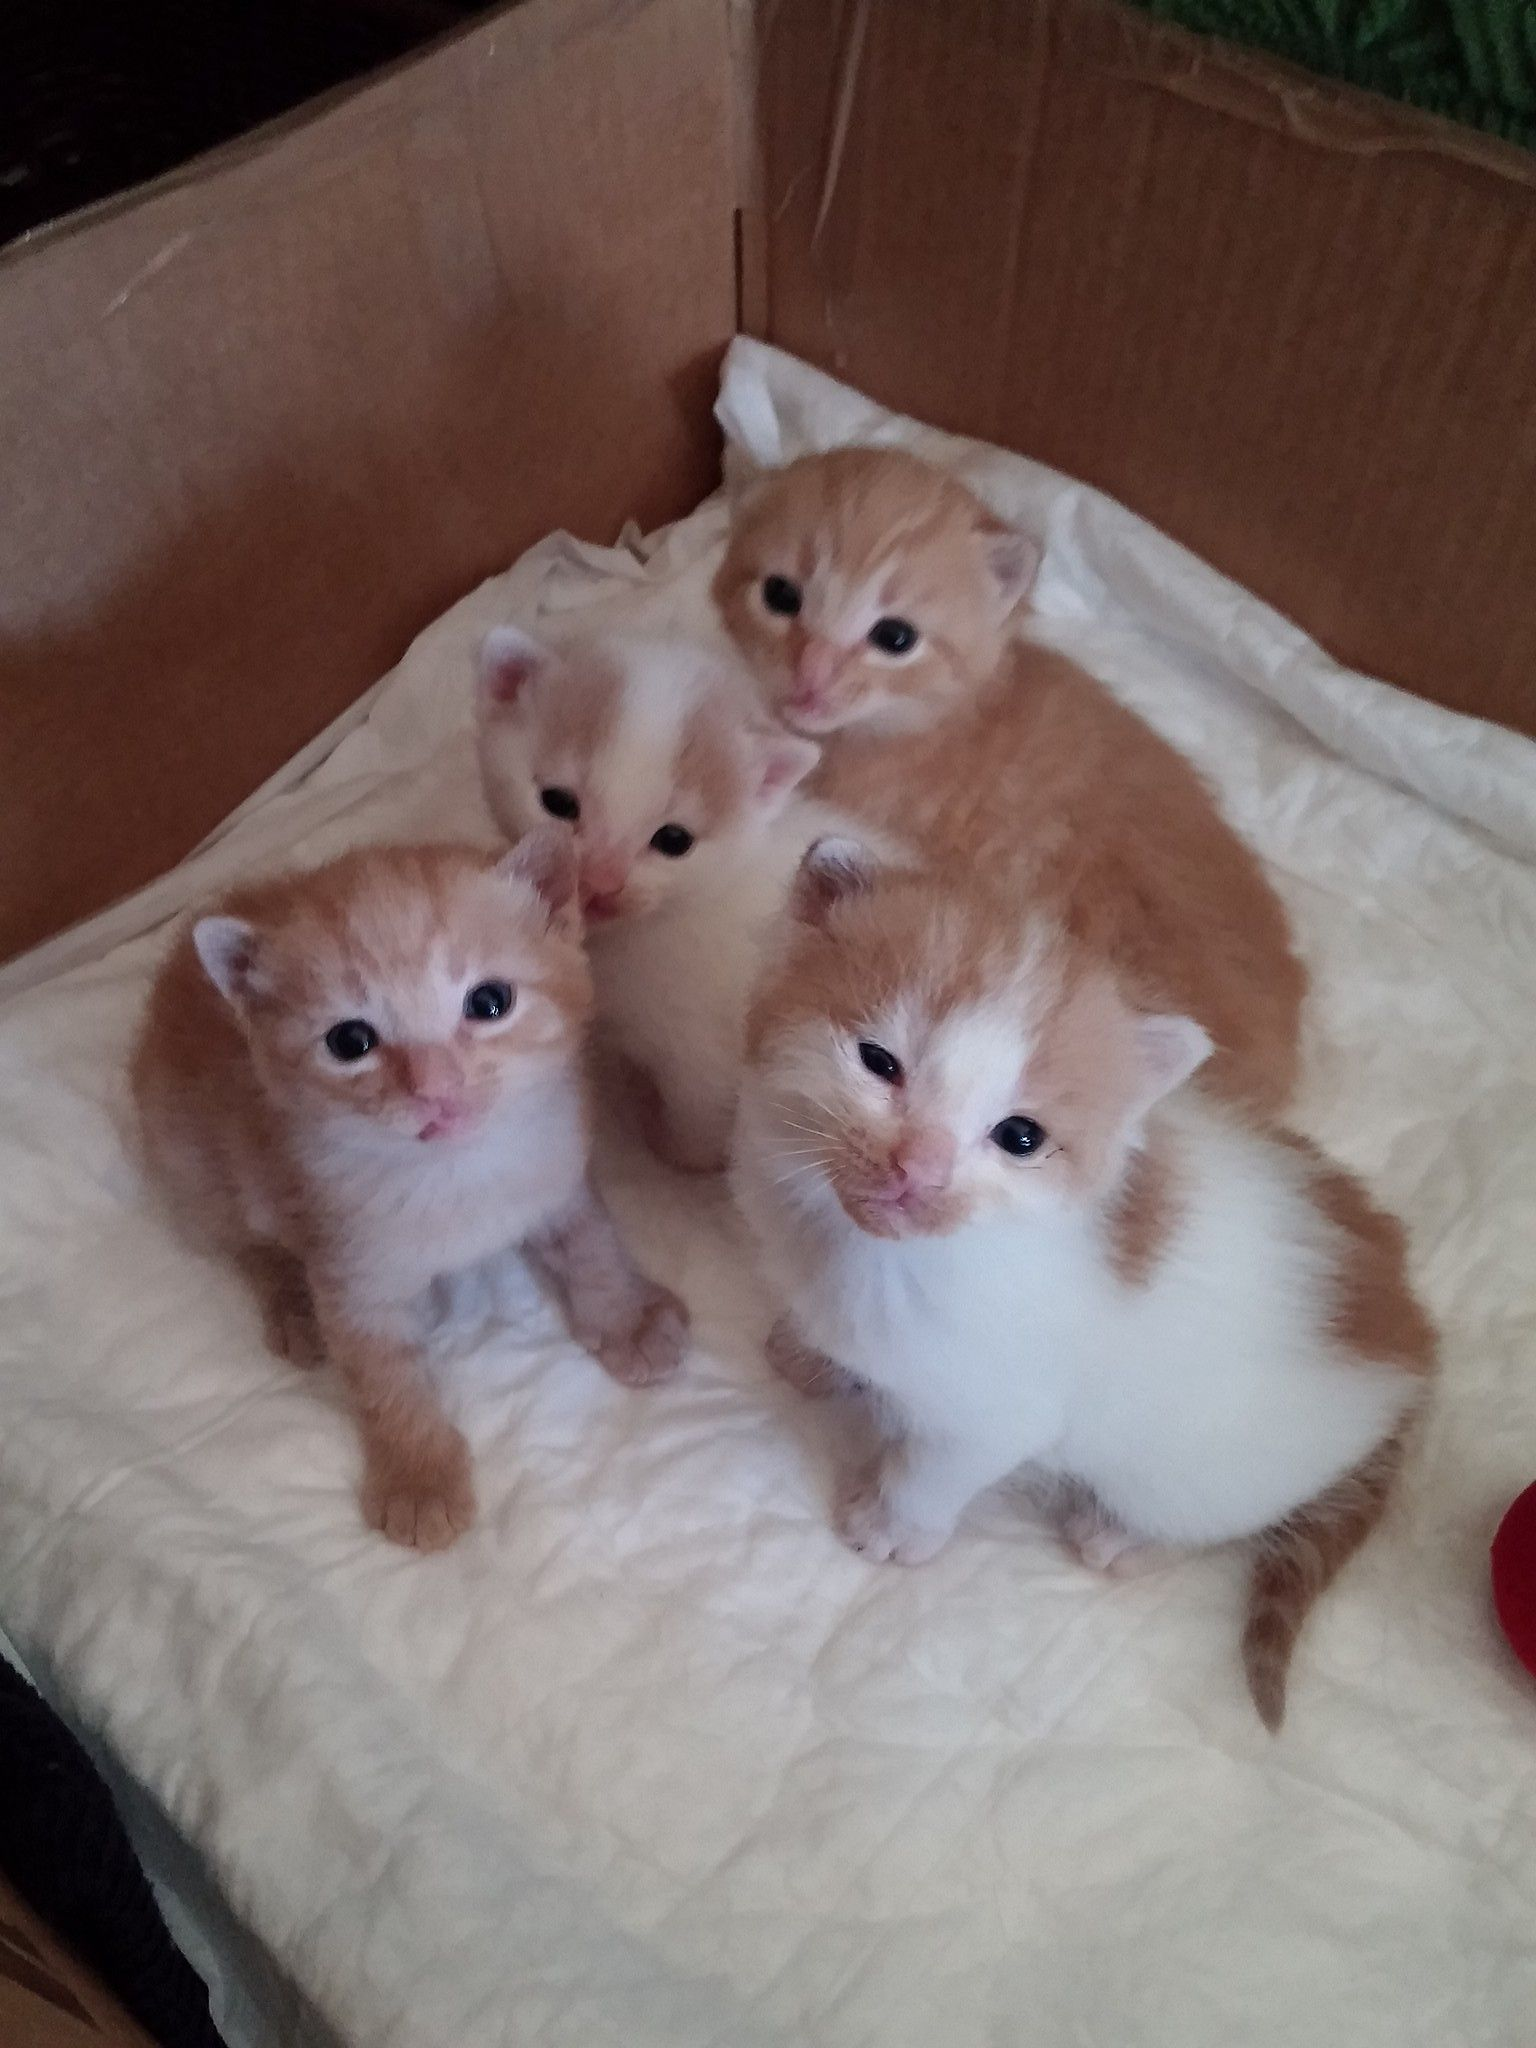 Cucciolo A Little Mini Kitten Cats Cats Kittens Cats Kittens